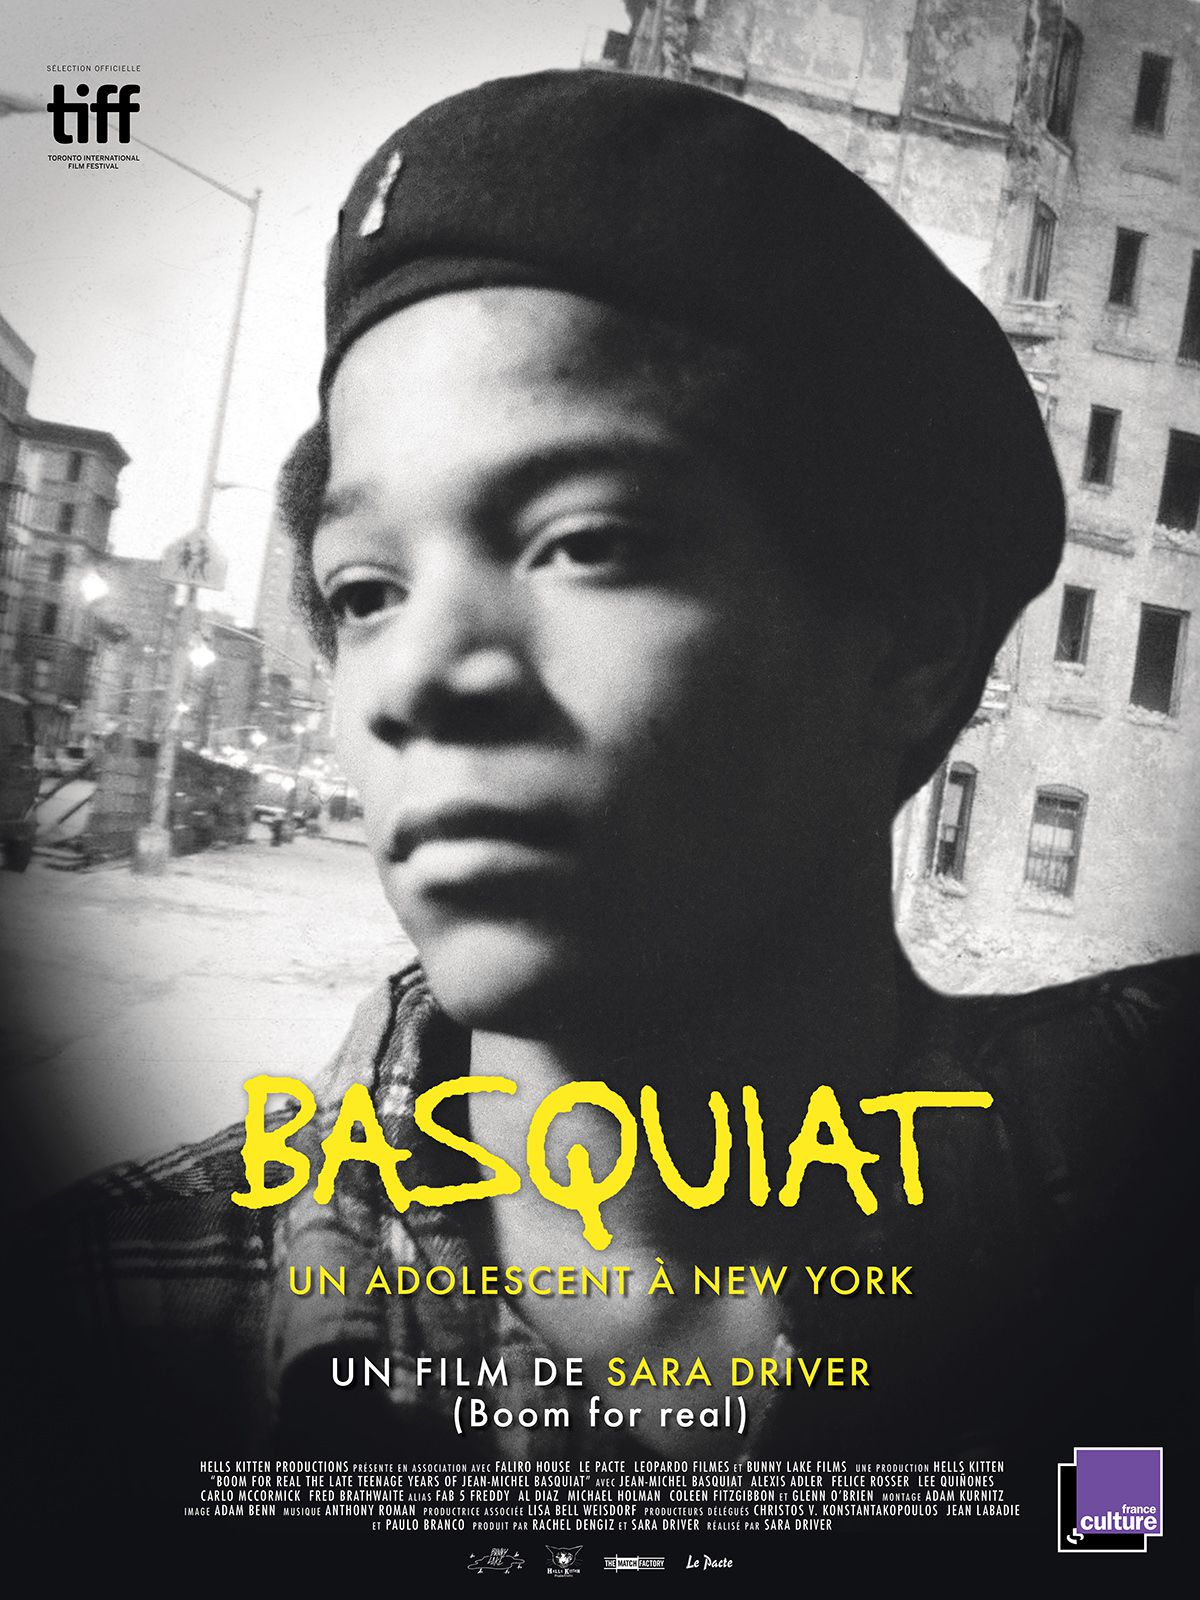 Basquiat - Un adolescent à New York - Documentaire (2018)